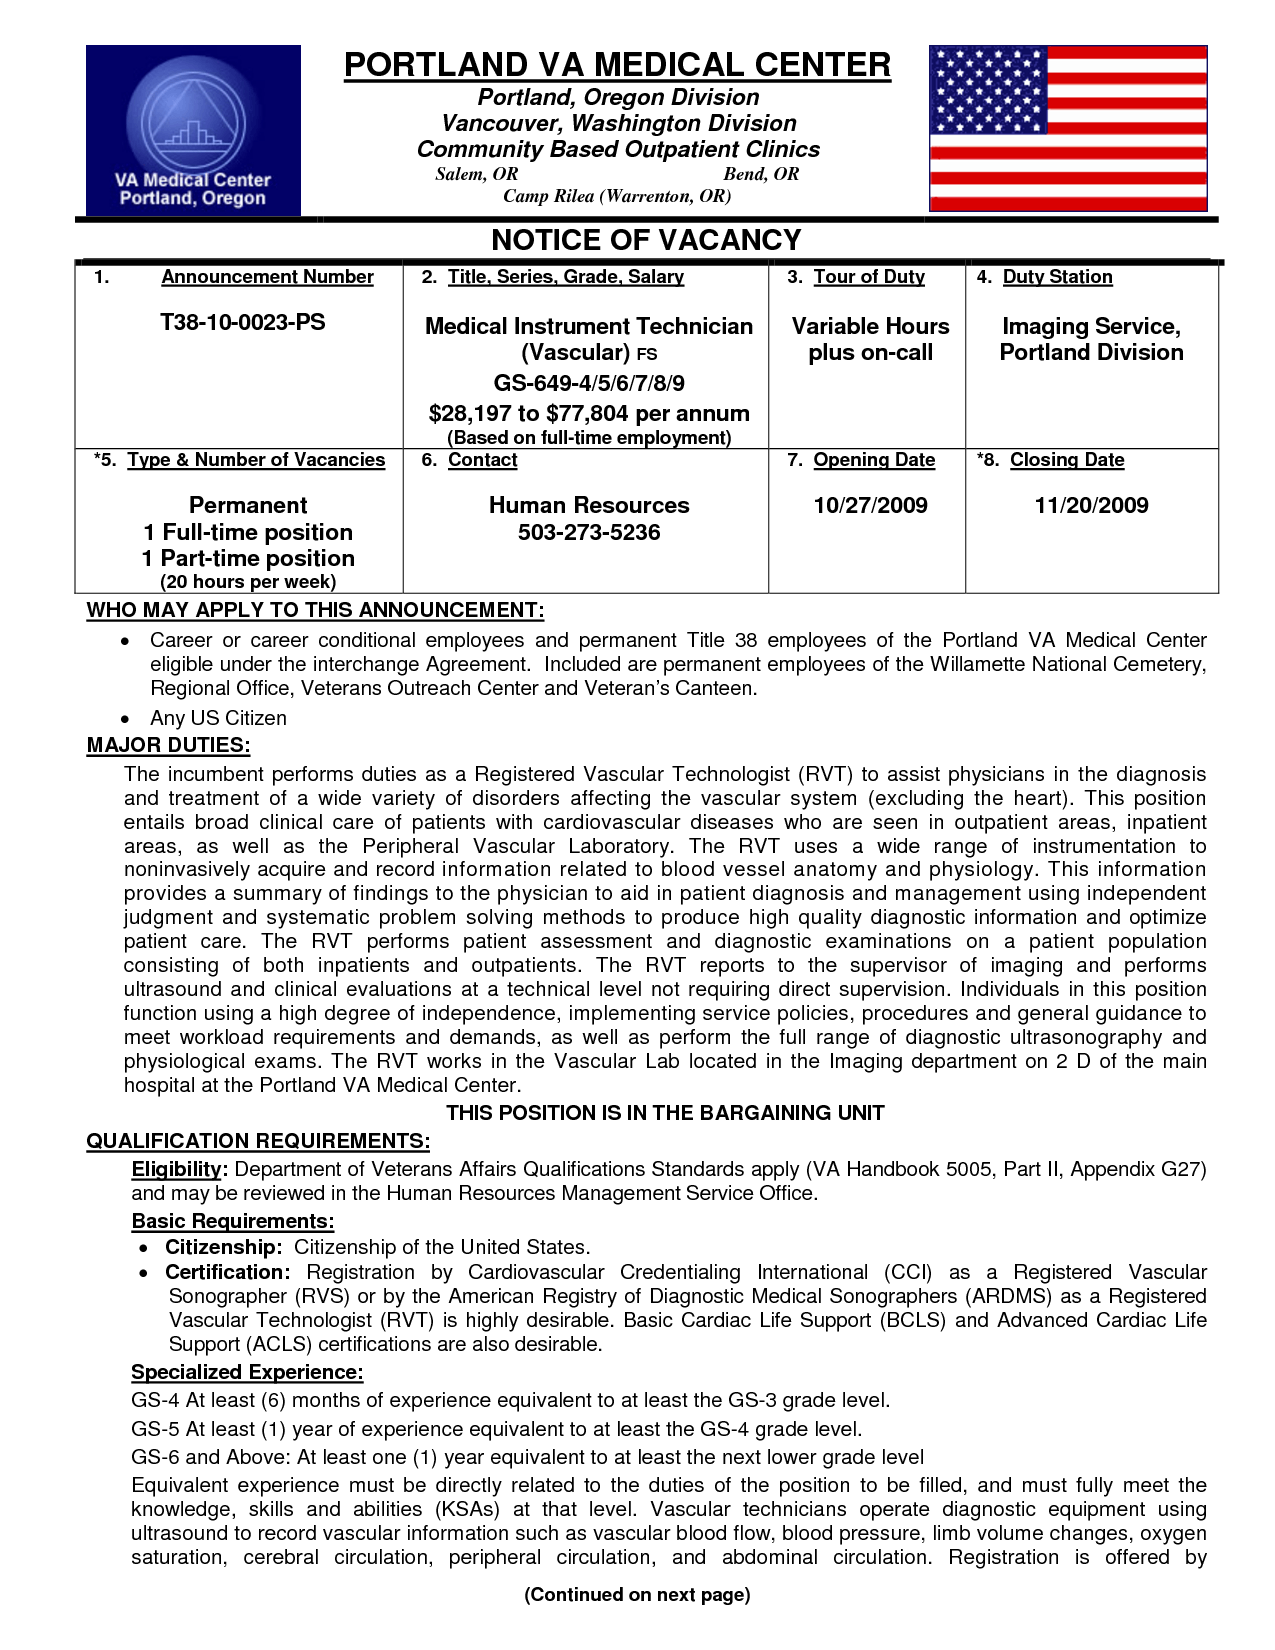 Resume Templates Veterans resume ResumeTemplates